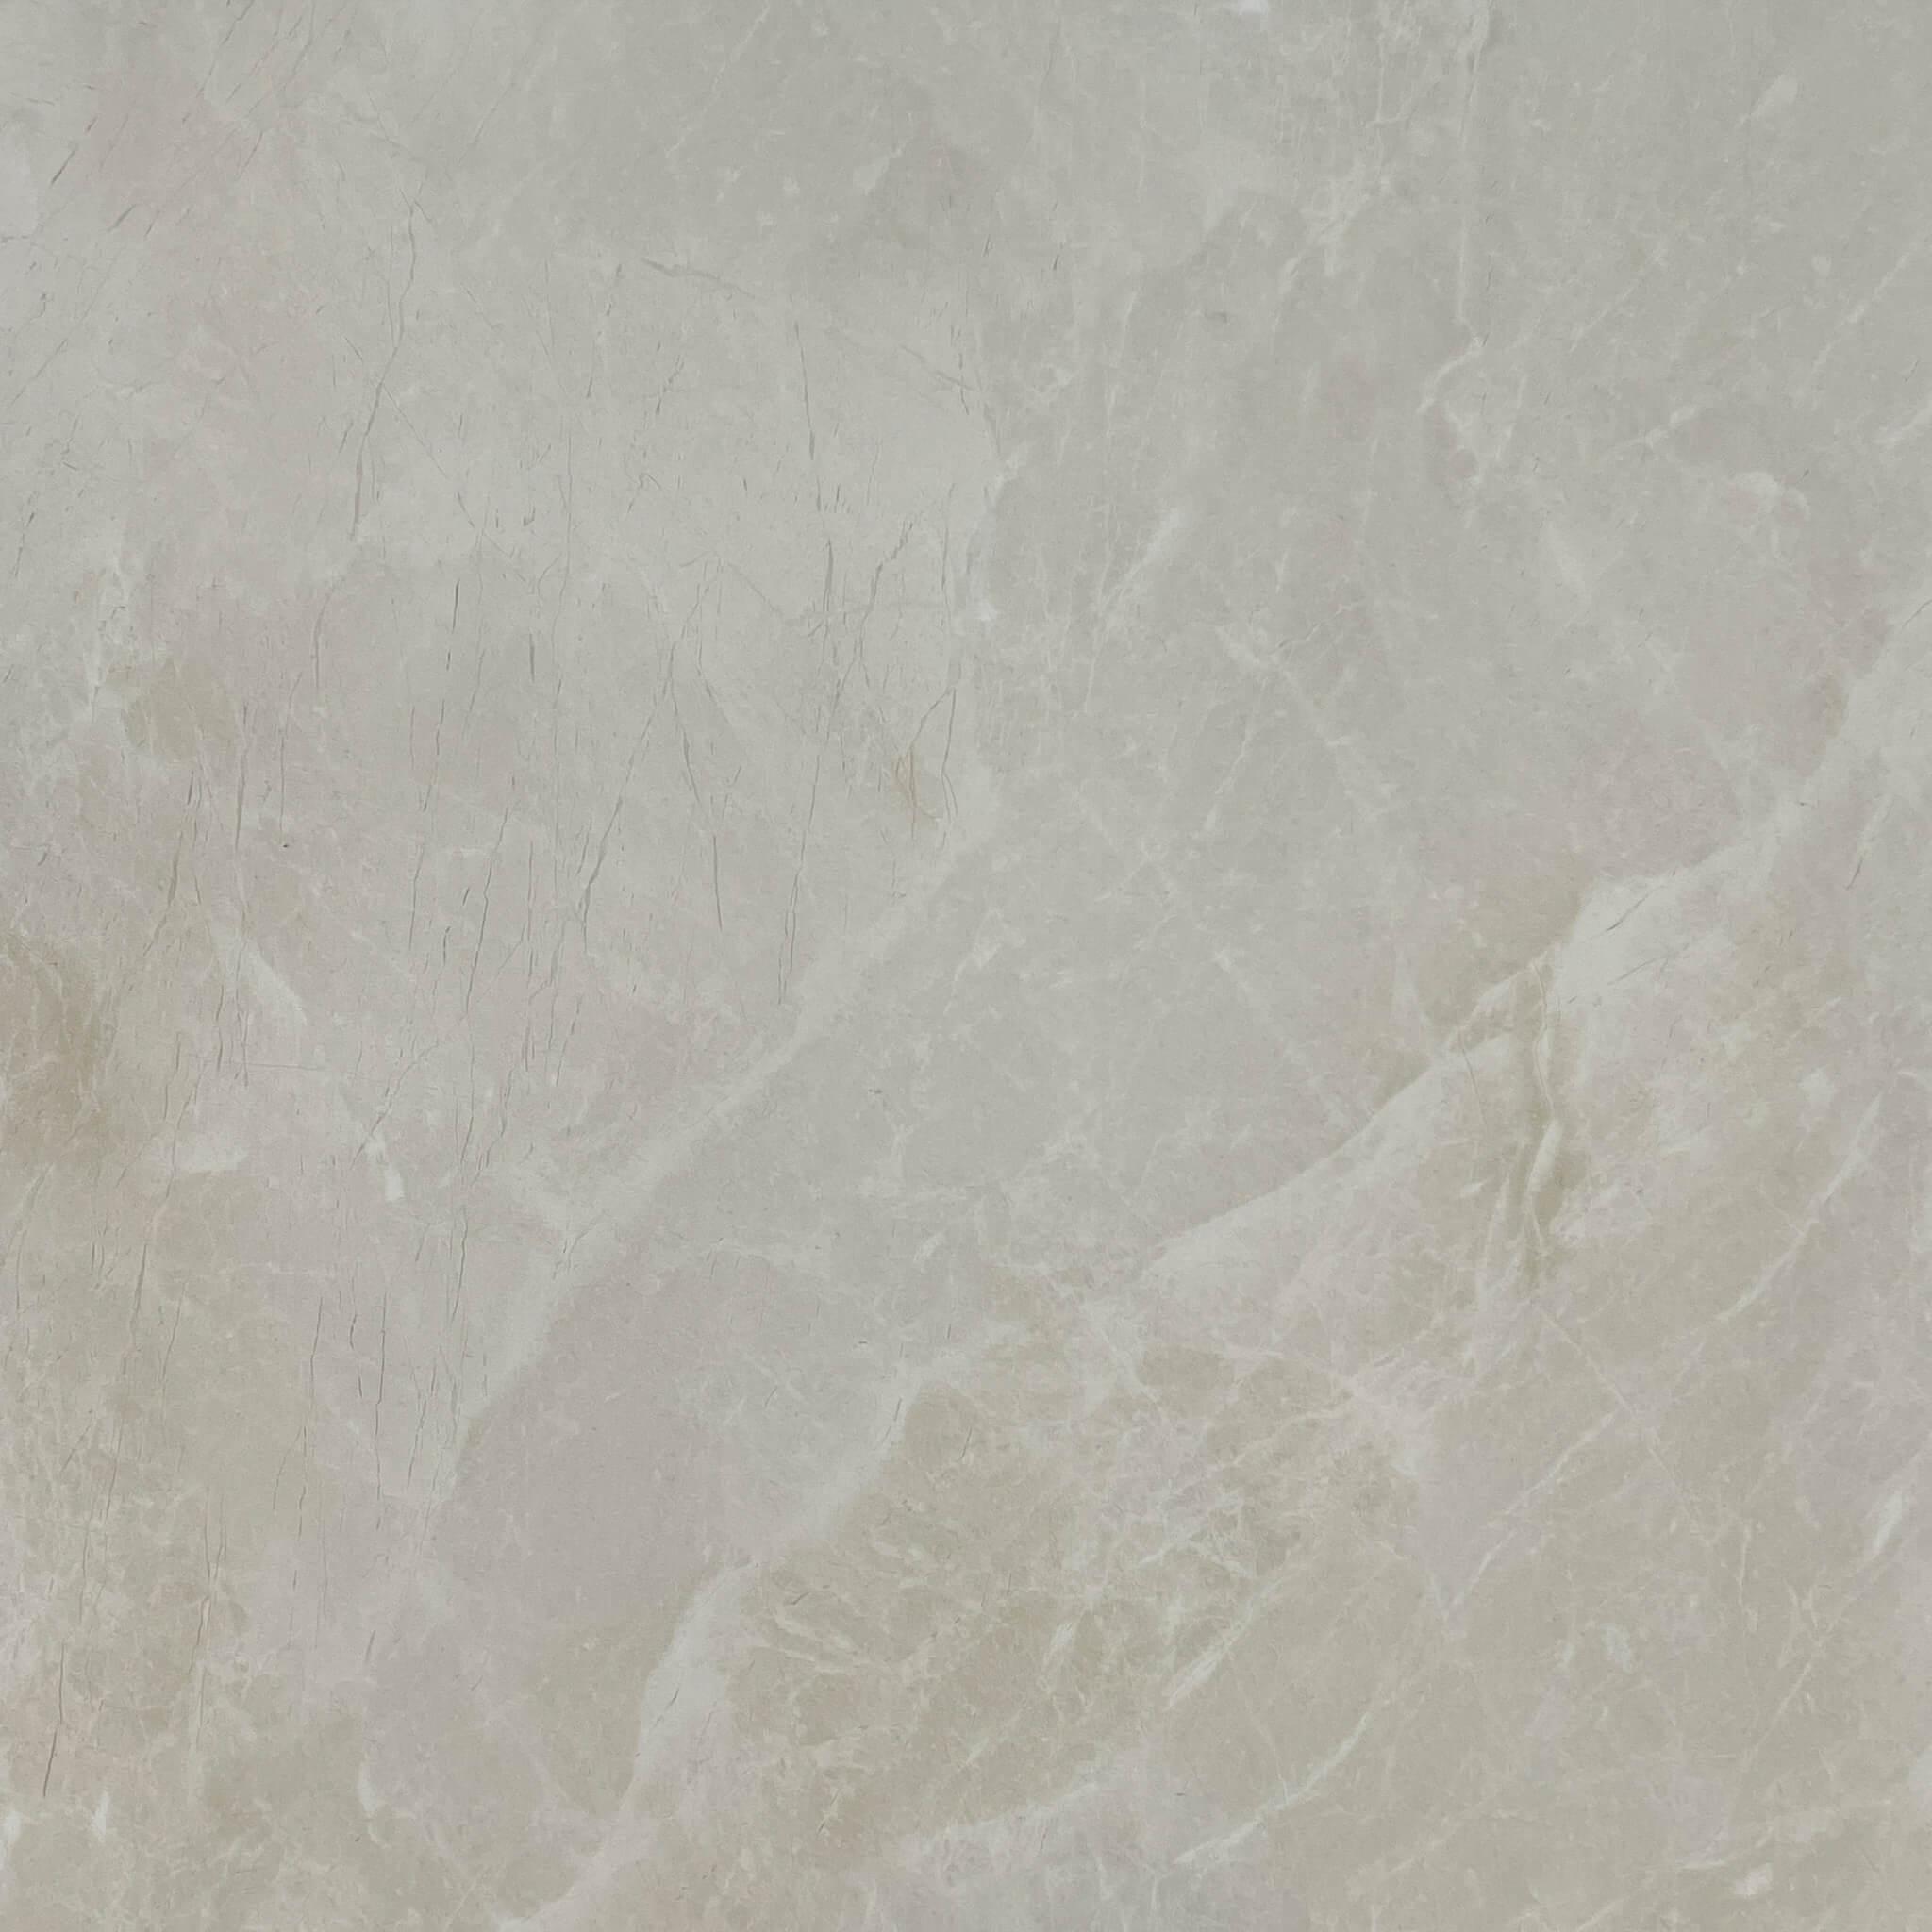 Crema Marfil Marble Look Matt Rectified Porcelain Tile 3819